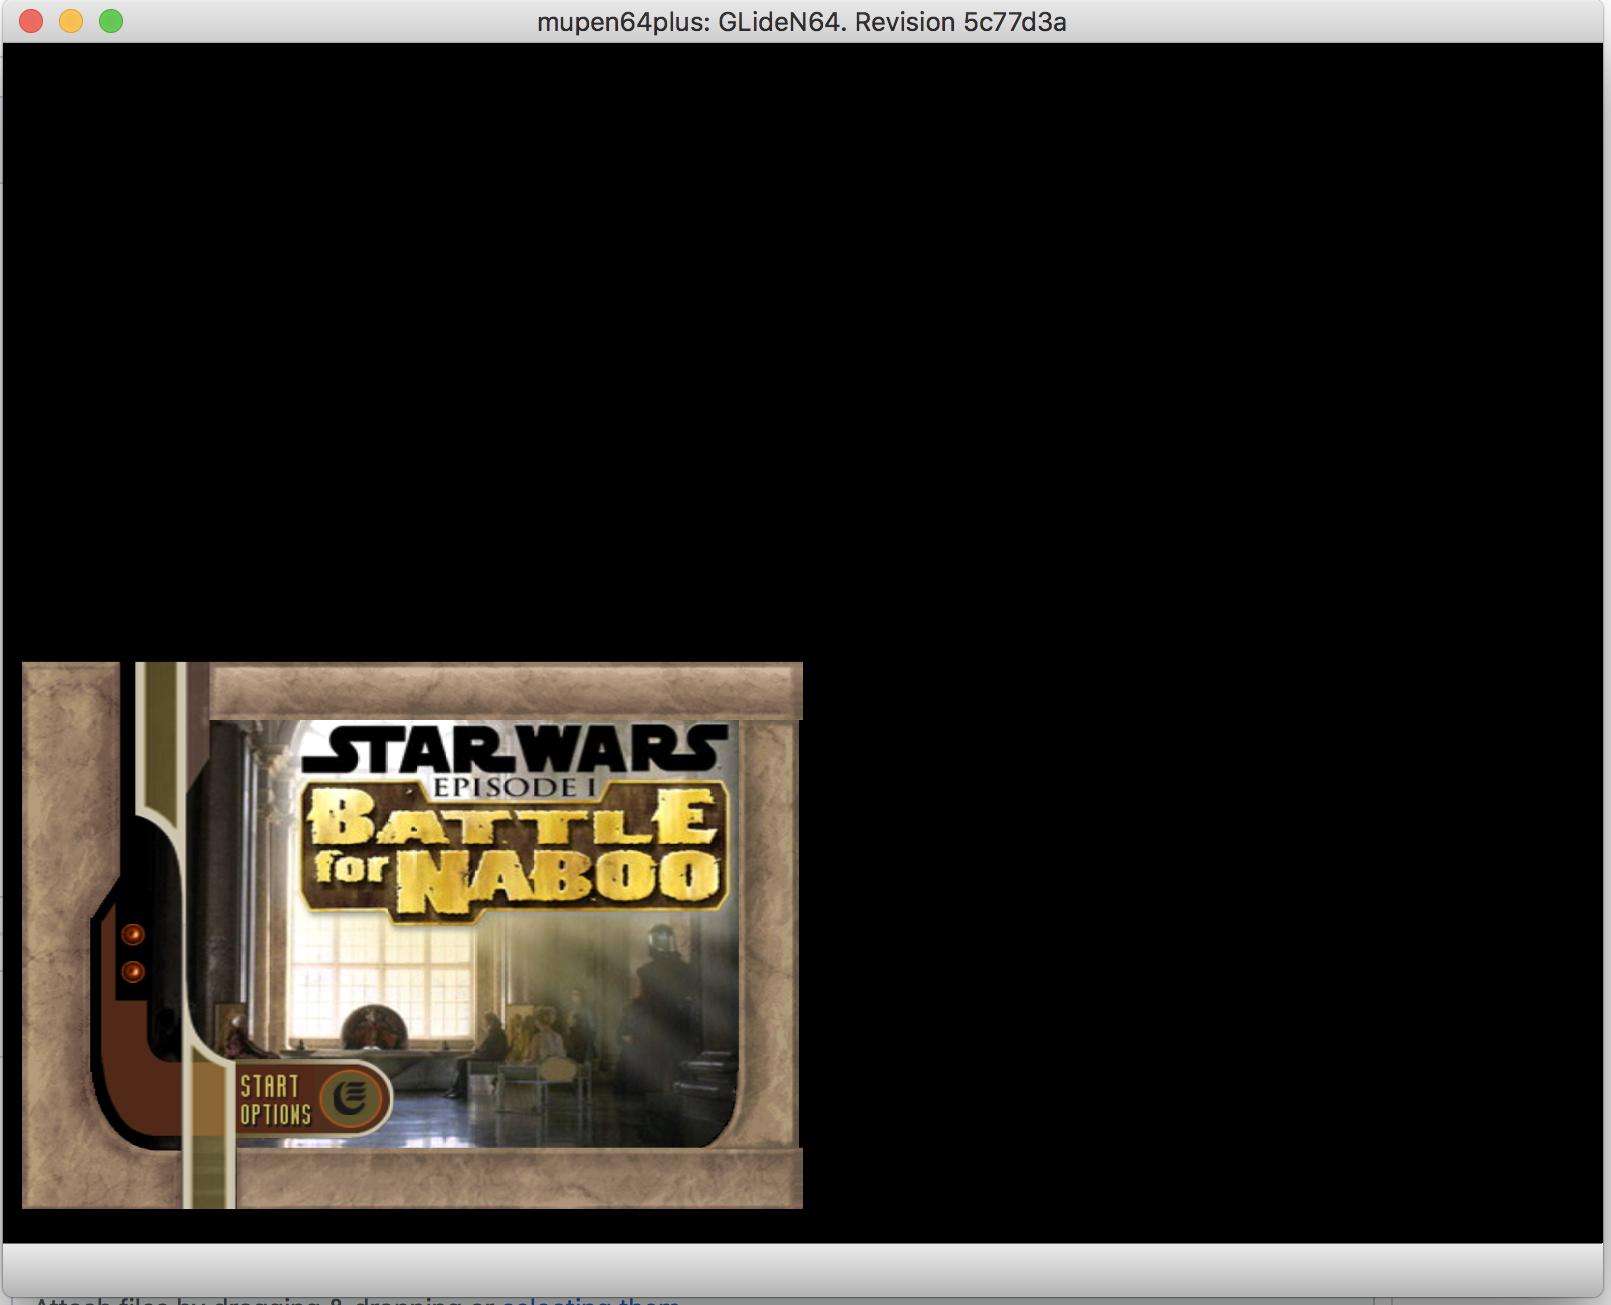 Developers - Indiana Jones/Battle of Naboo microcode